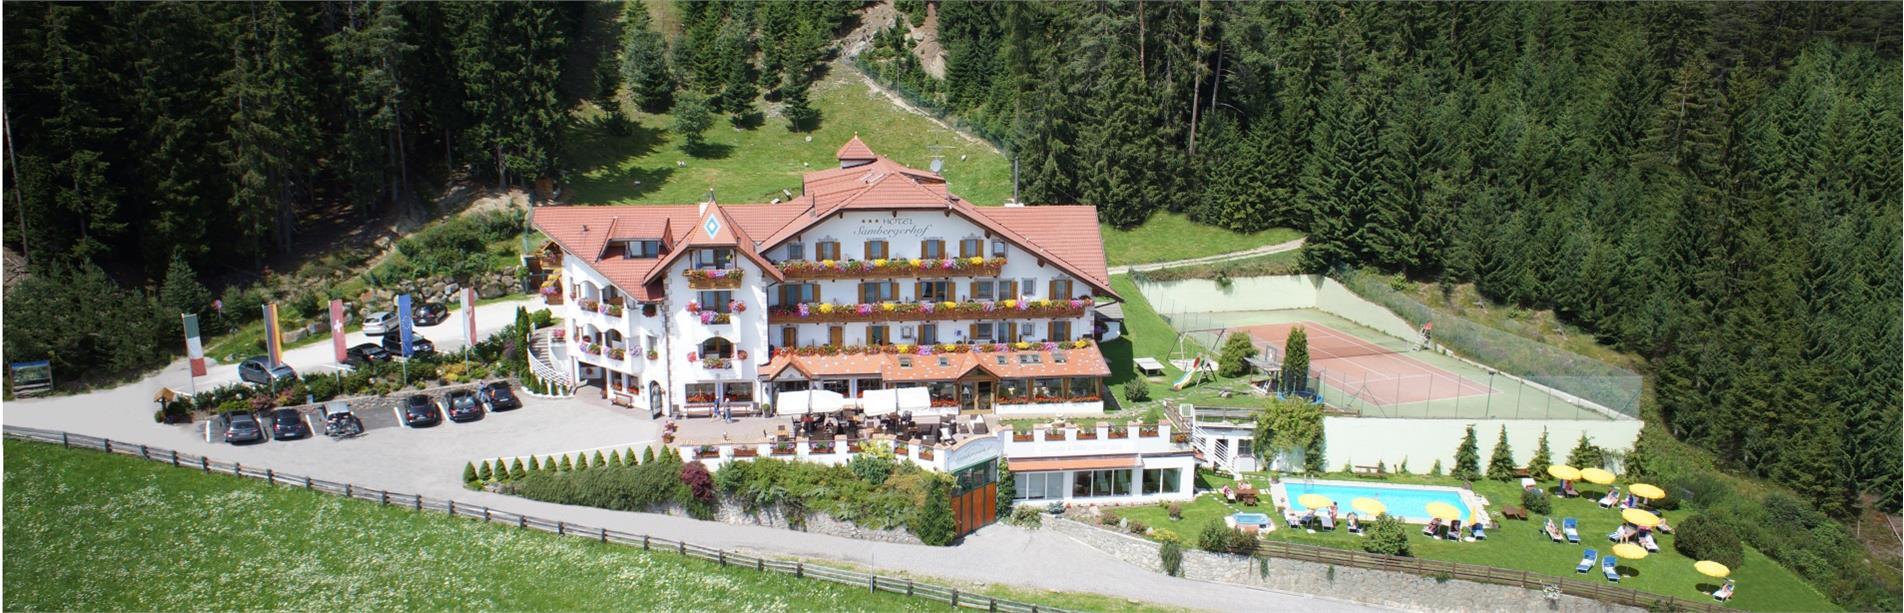 hotel-sambergerhof